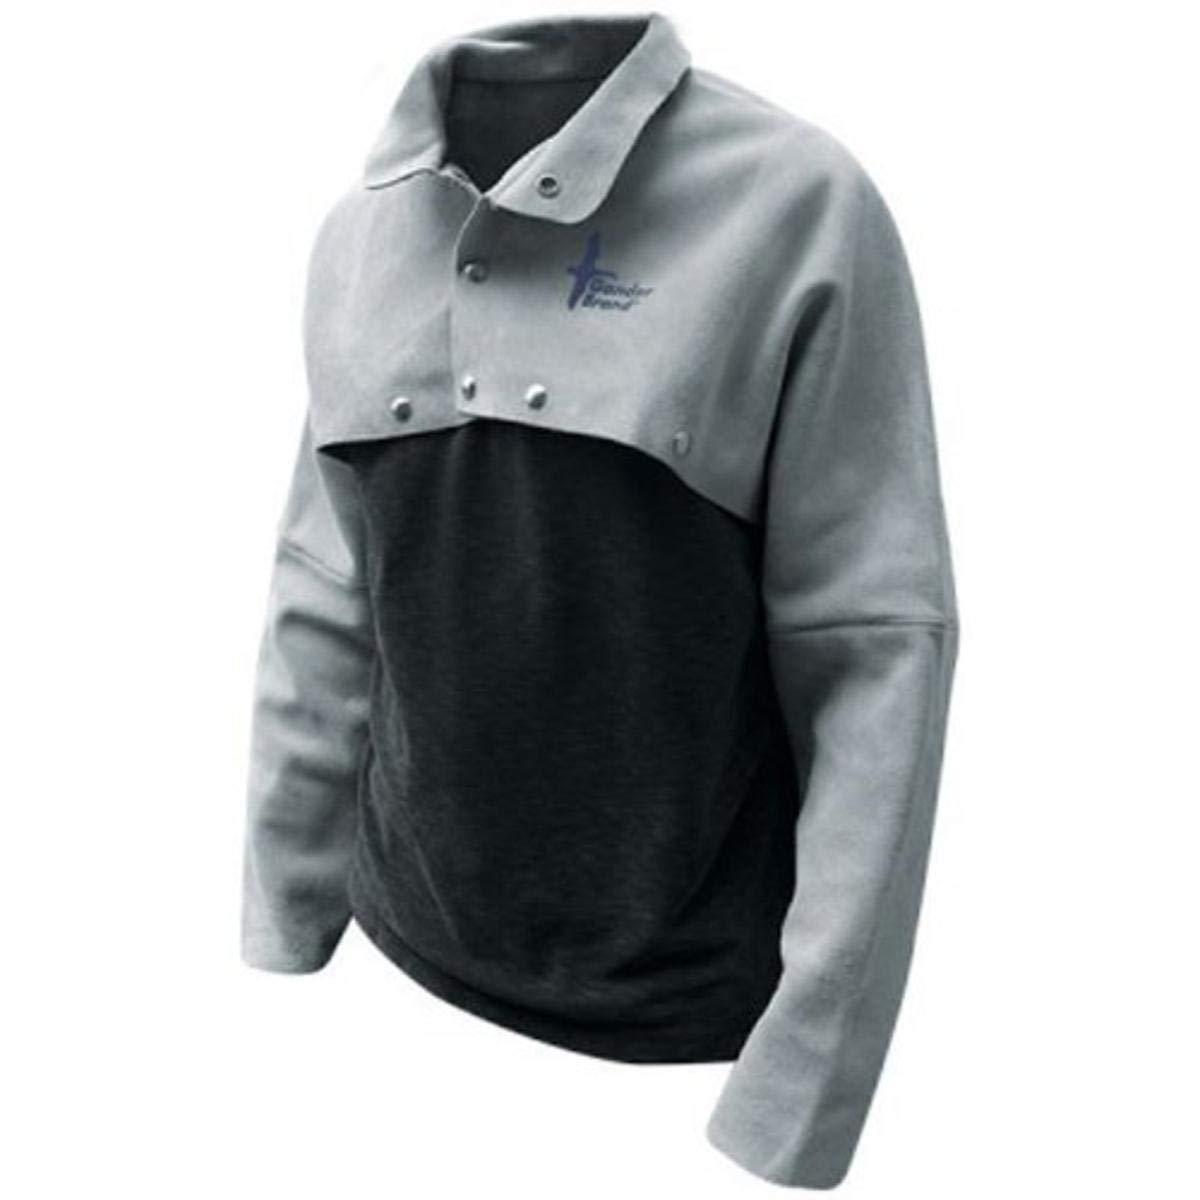 Bob Dale 63-1-71P-XL Premium Pearl Split Leather Cape Sleeve Welders Jacket X-Large Grey